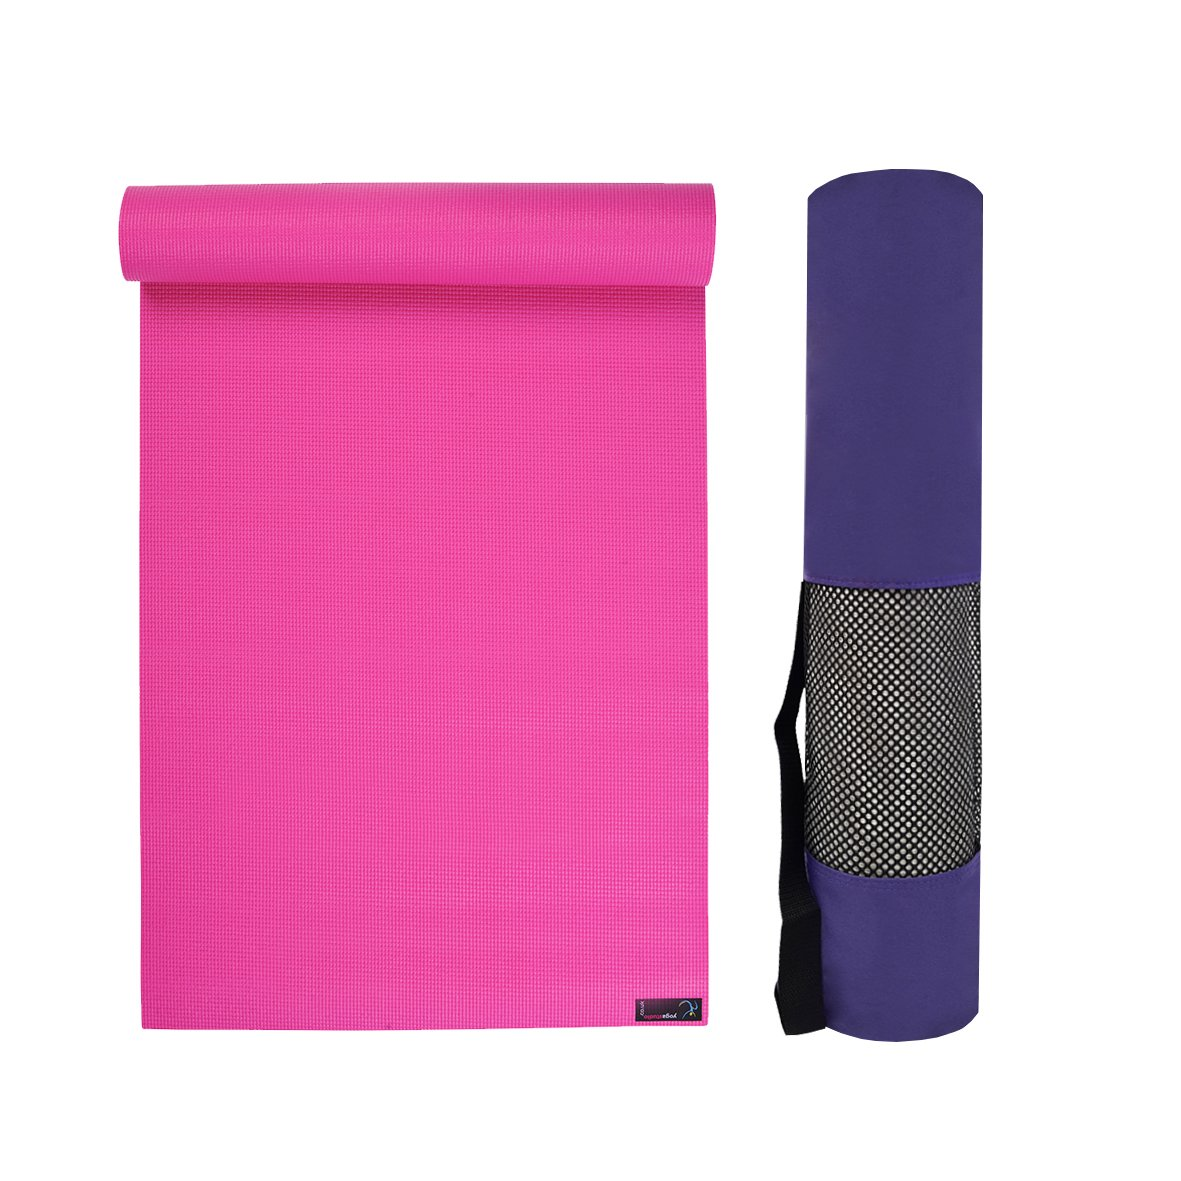 Yoga Studio Basic - Esterilla de Yoga (61 x 183 cm ...